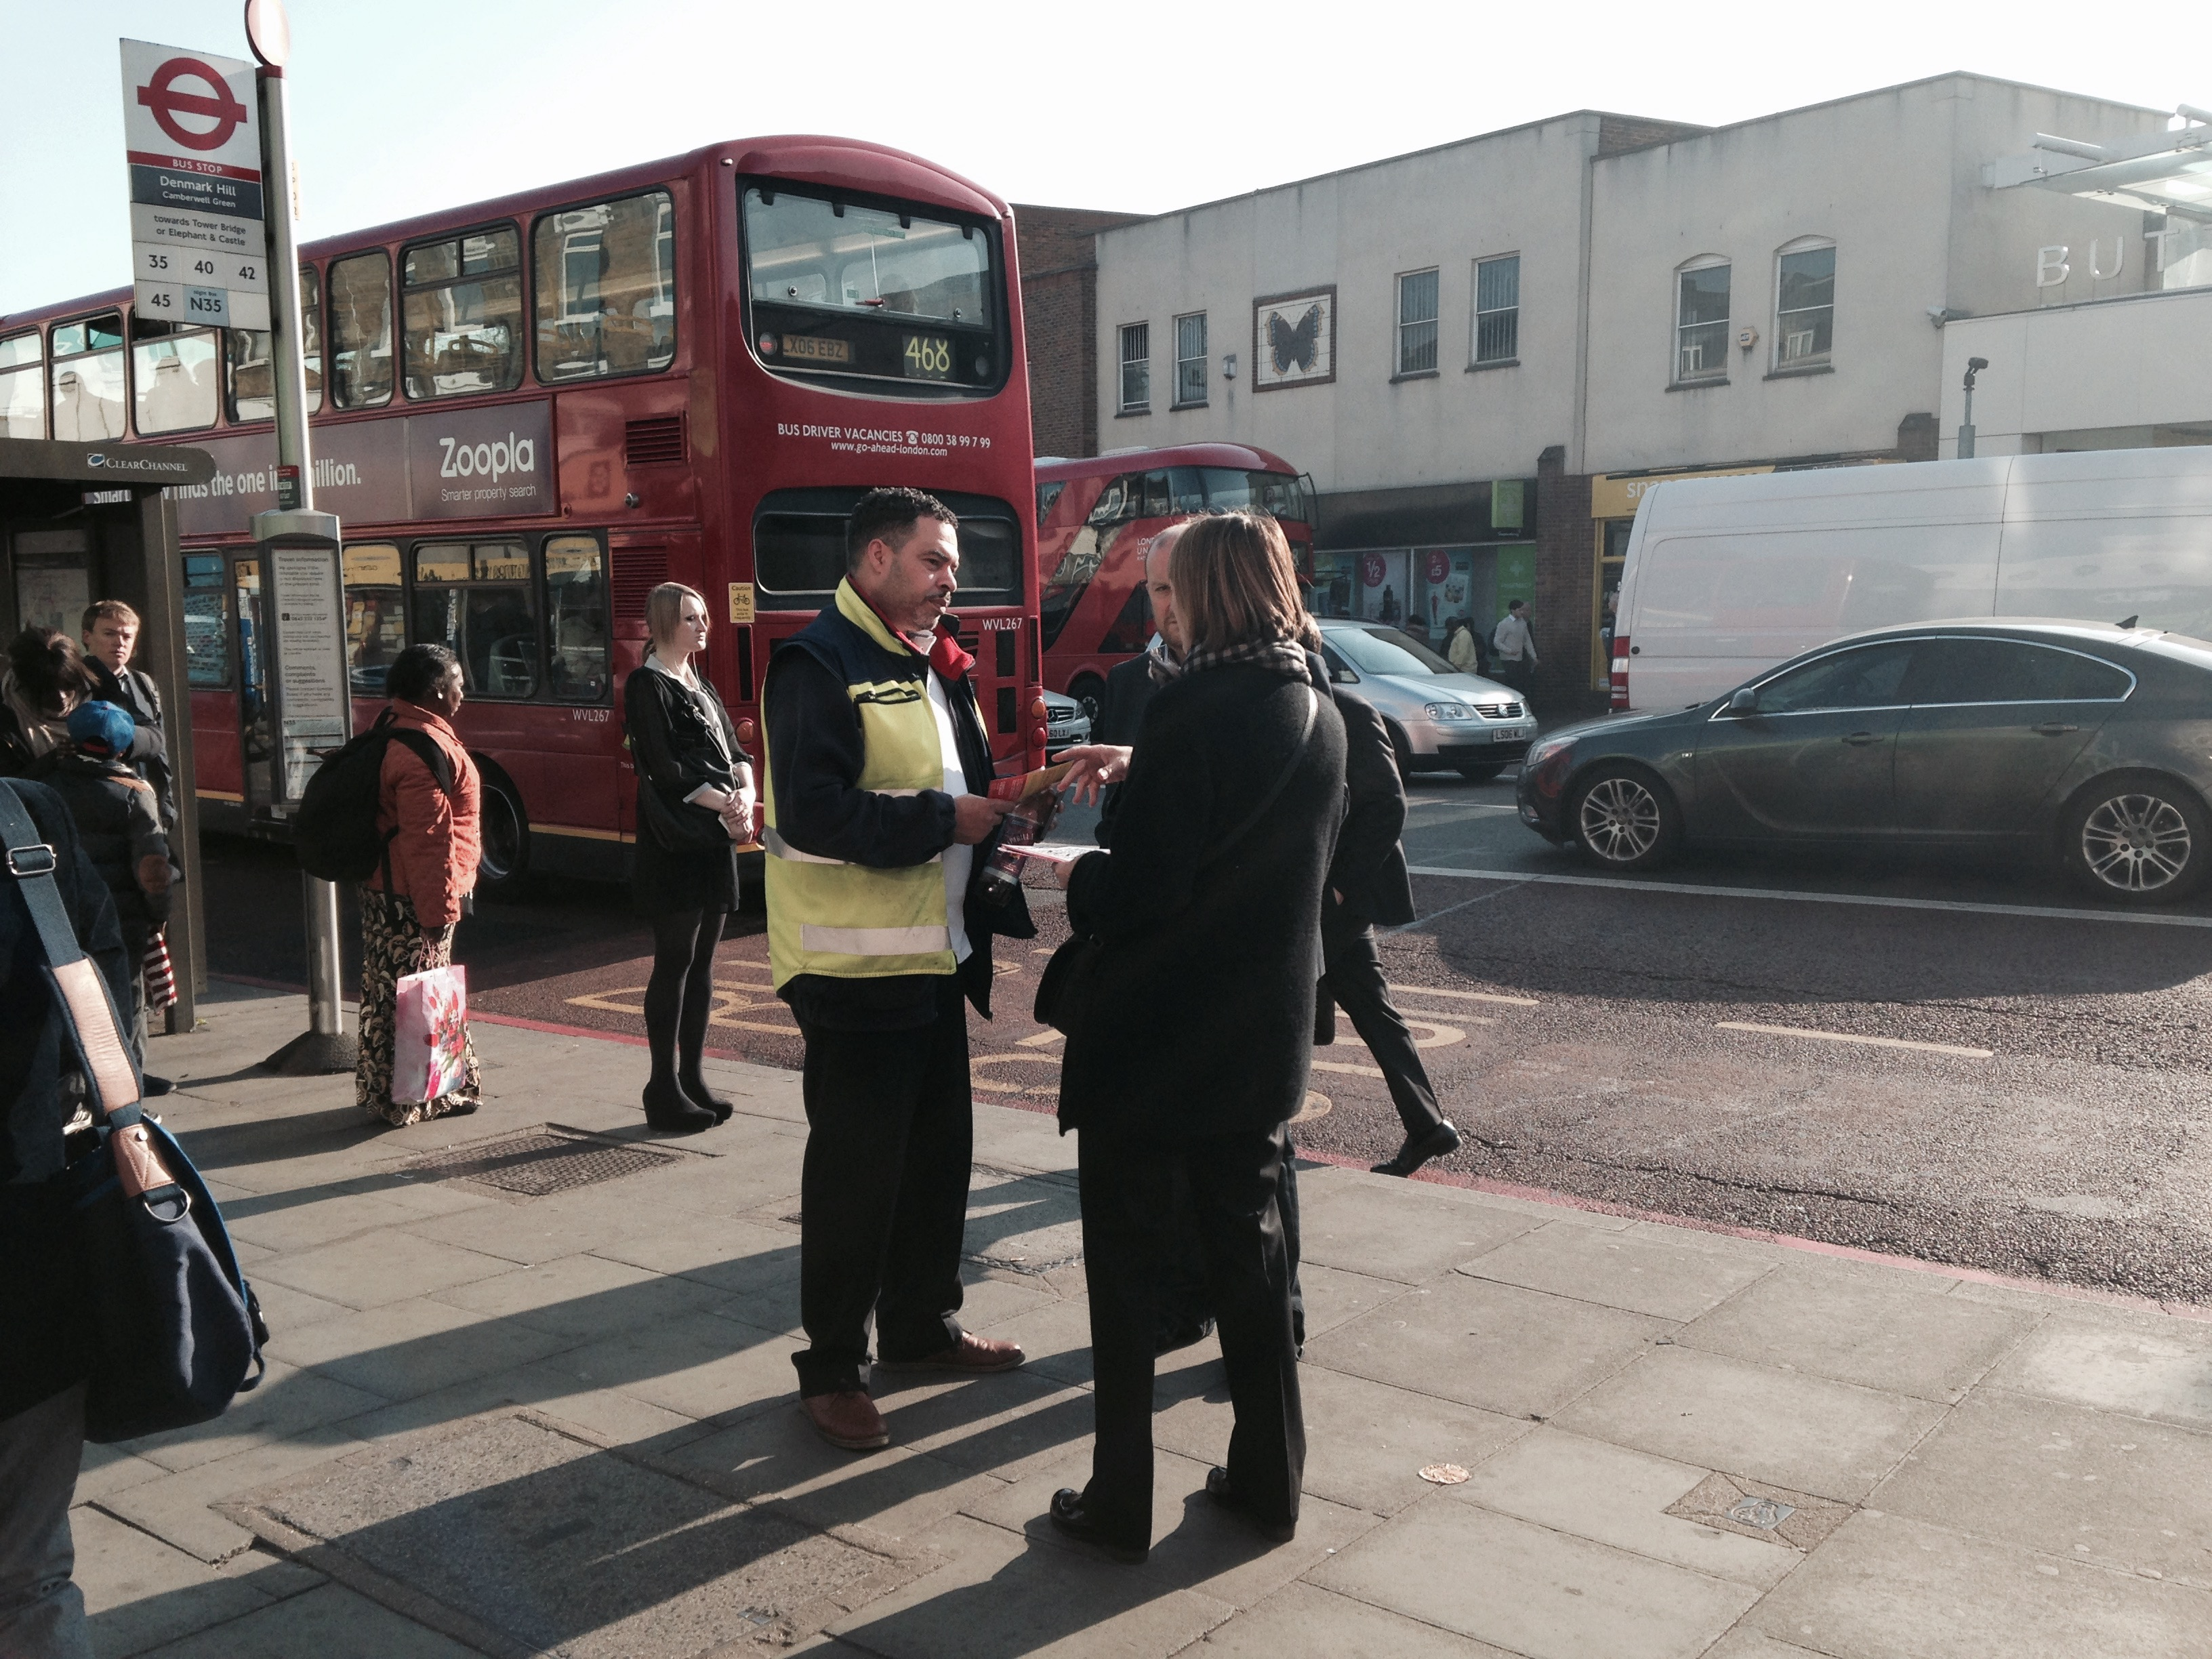 Camberwell_Green_bus_stop_20.4.15.jpg